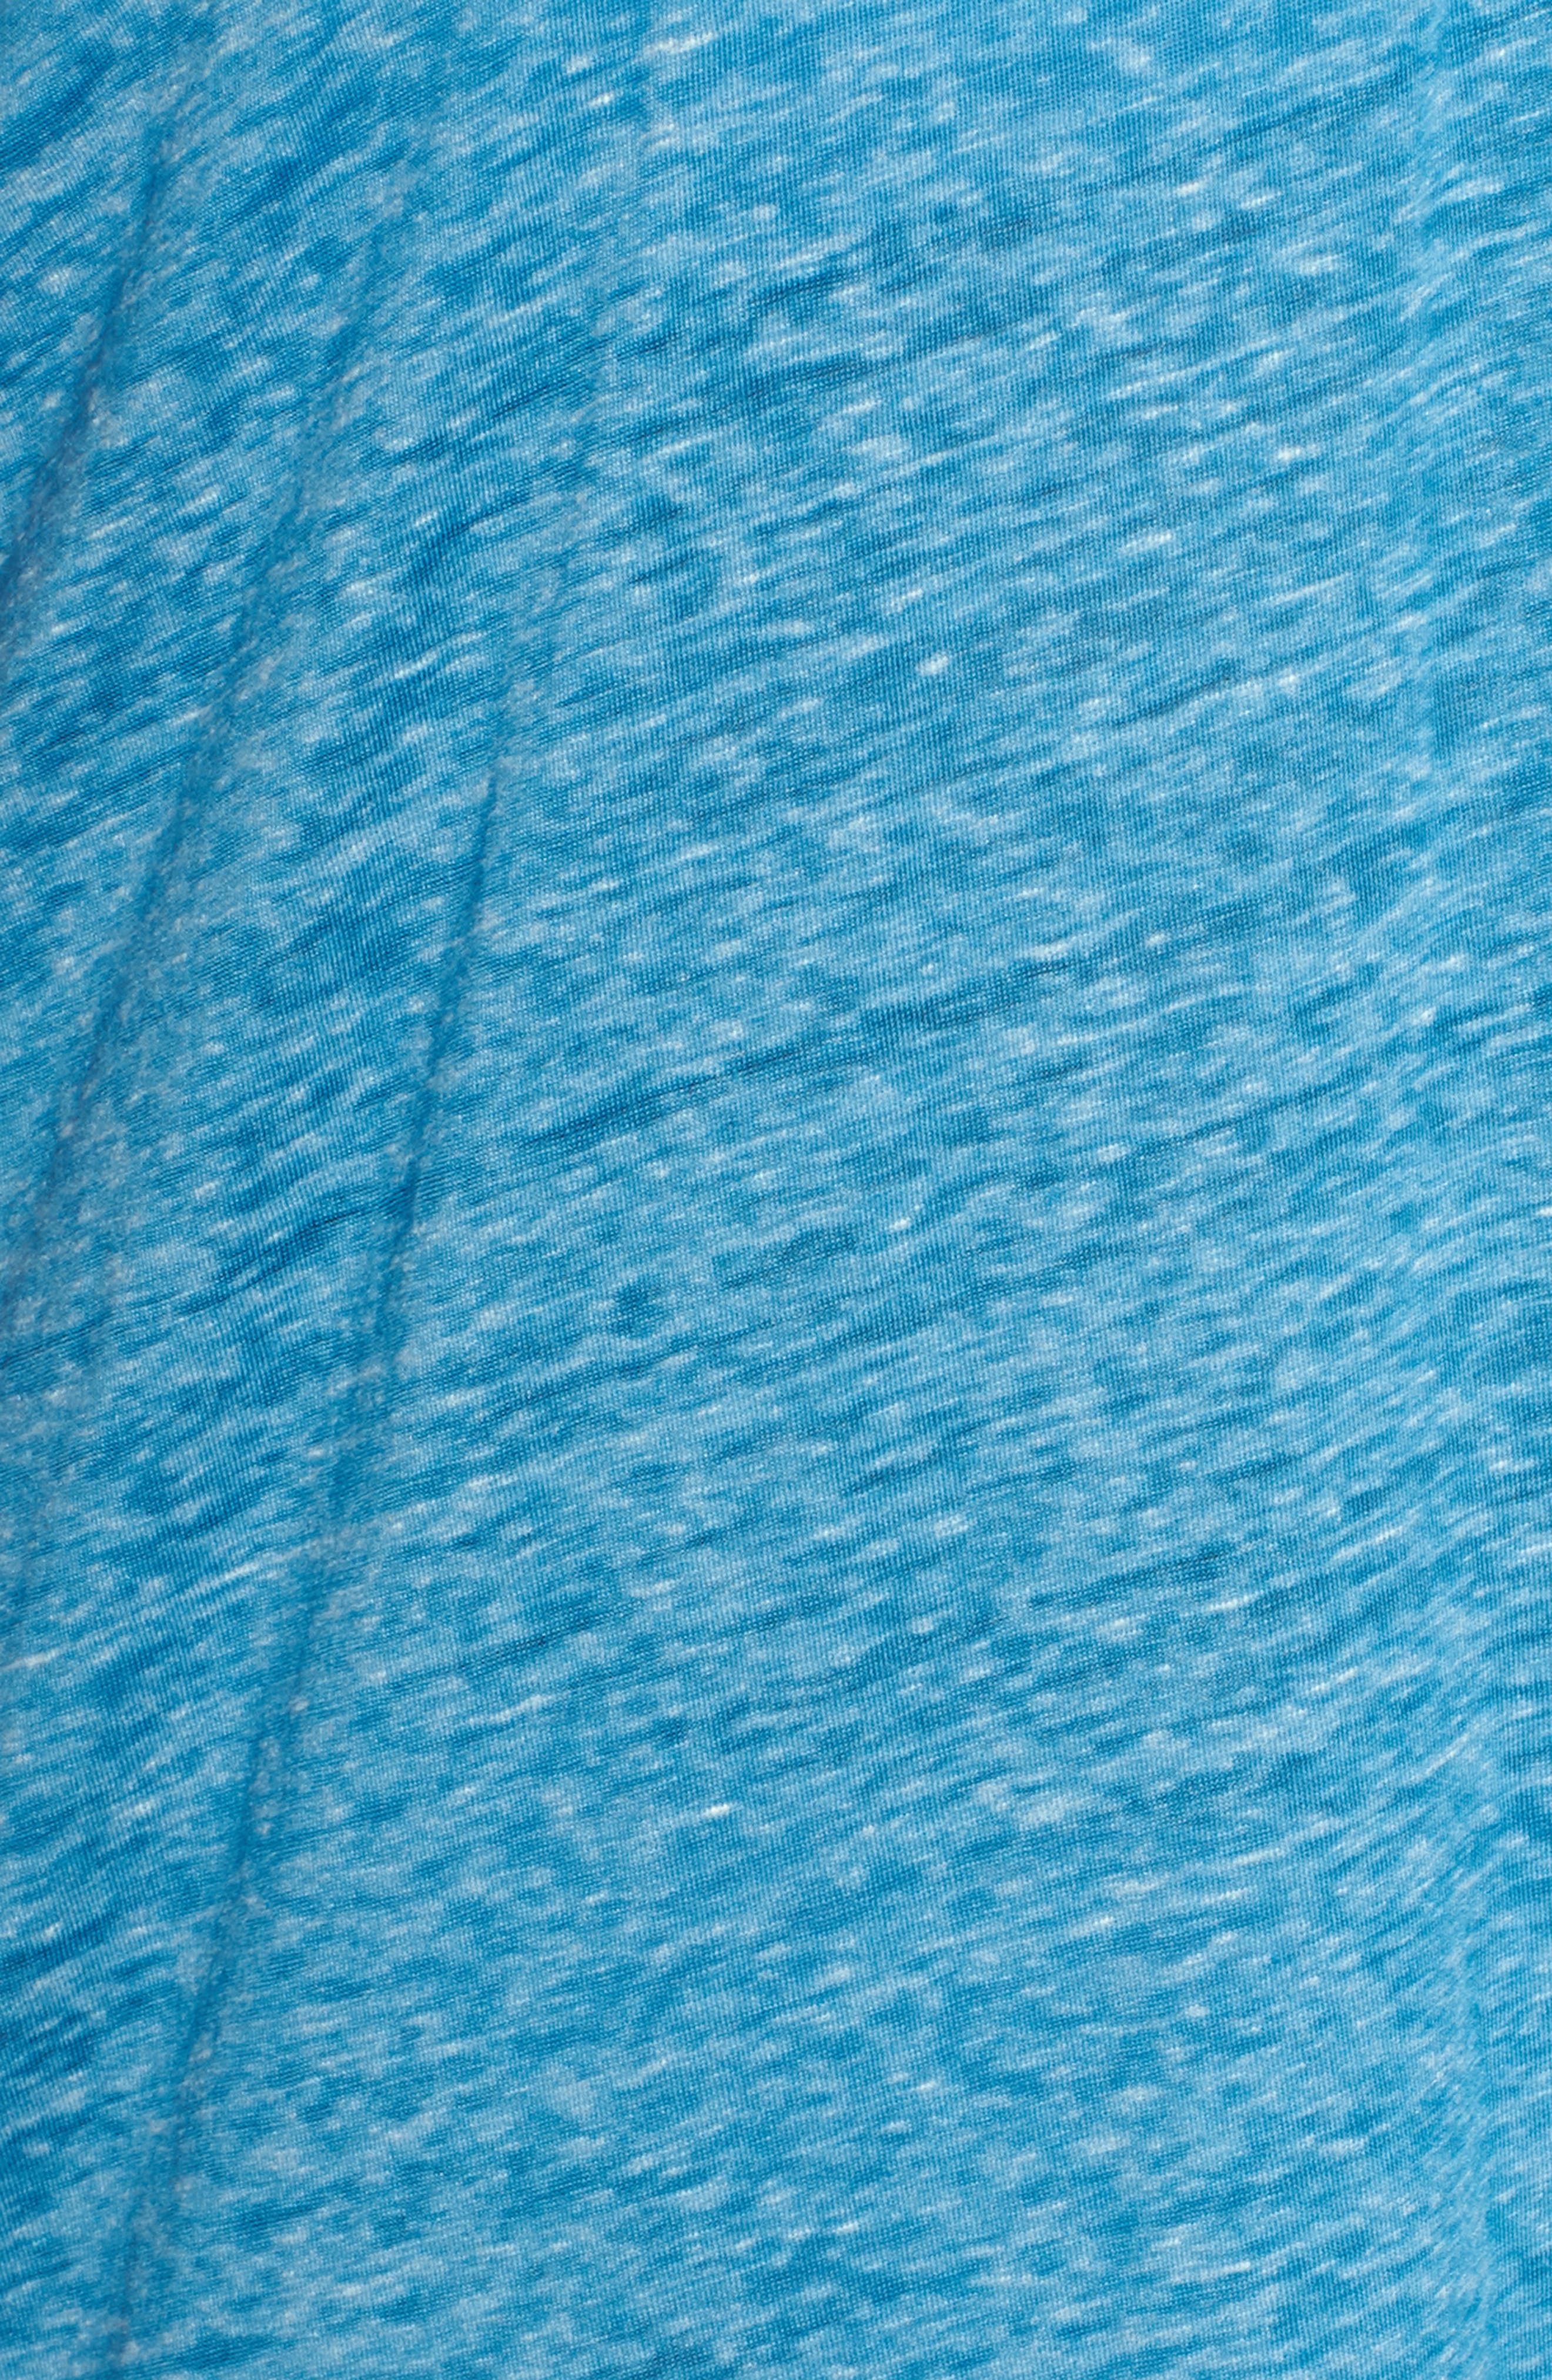 Maxi Cover-Up Dress,                             Alternate thumbnail 25, color,